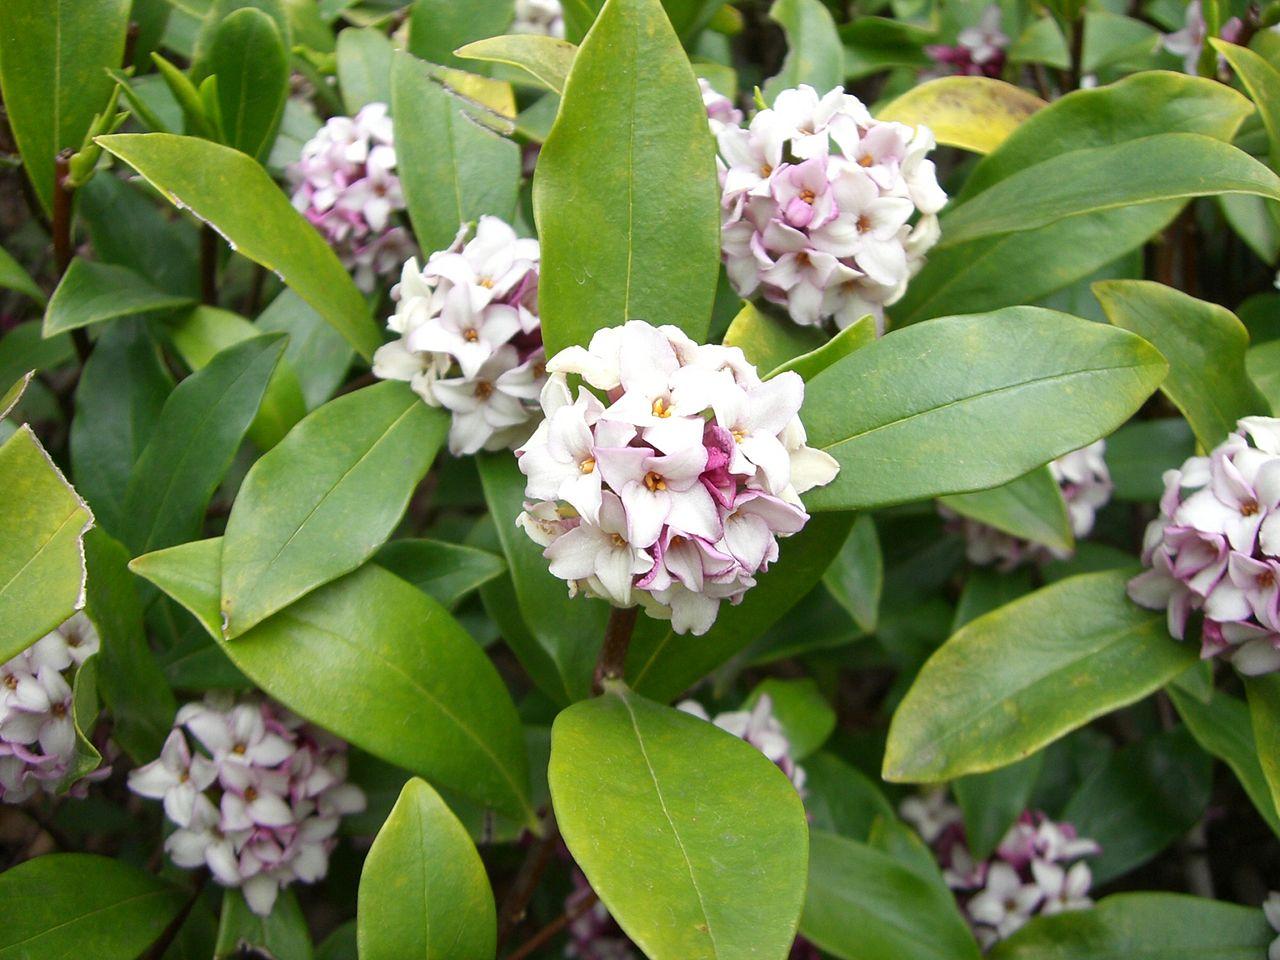 La Daphne odora se multiplica por esquejes